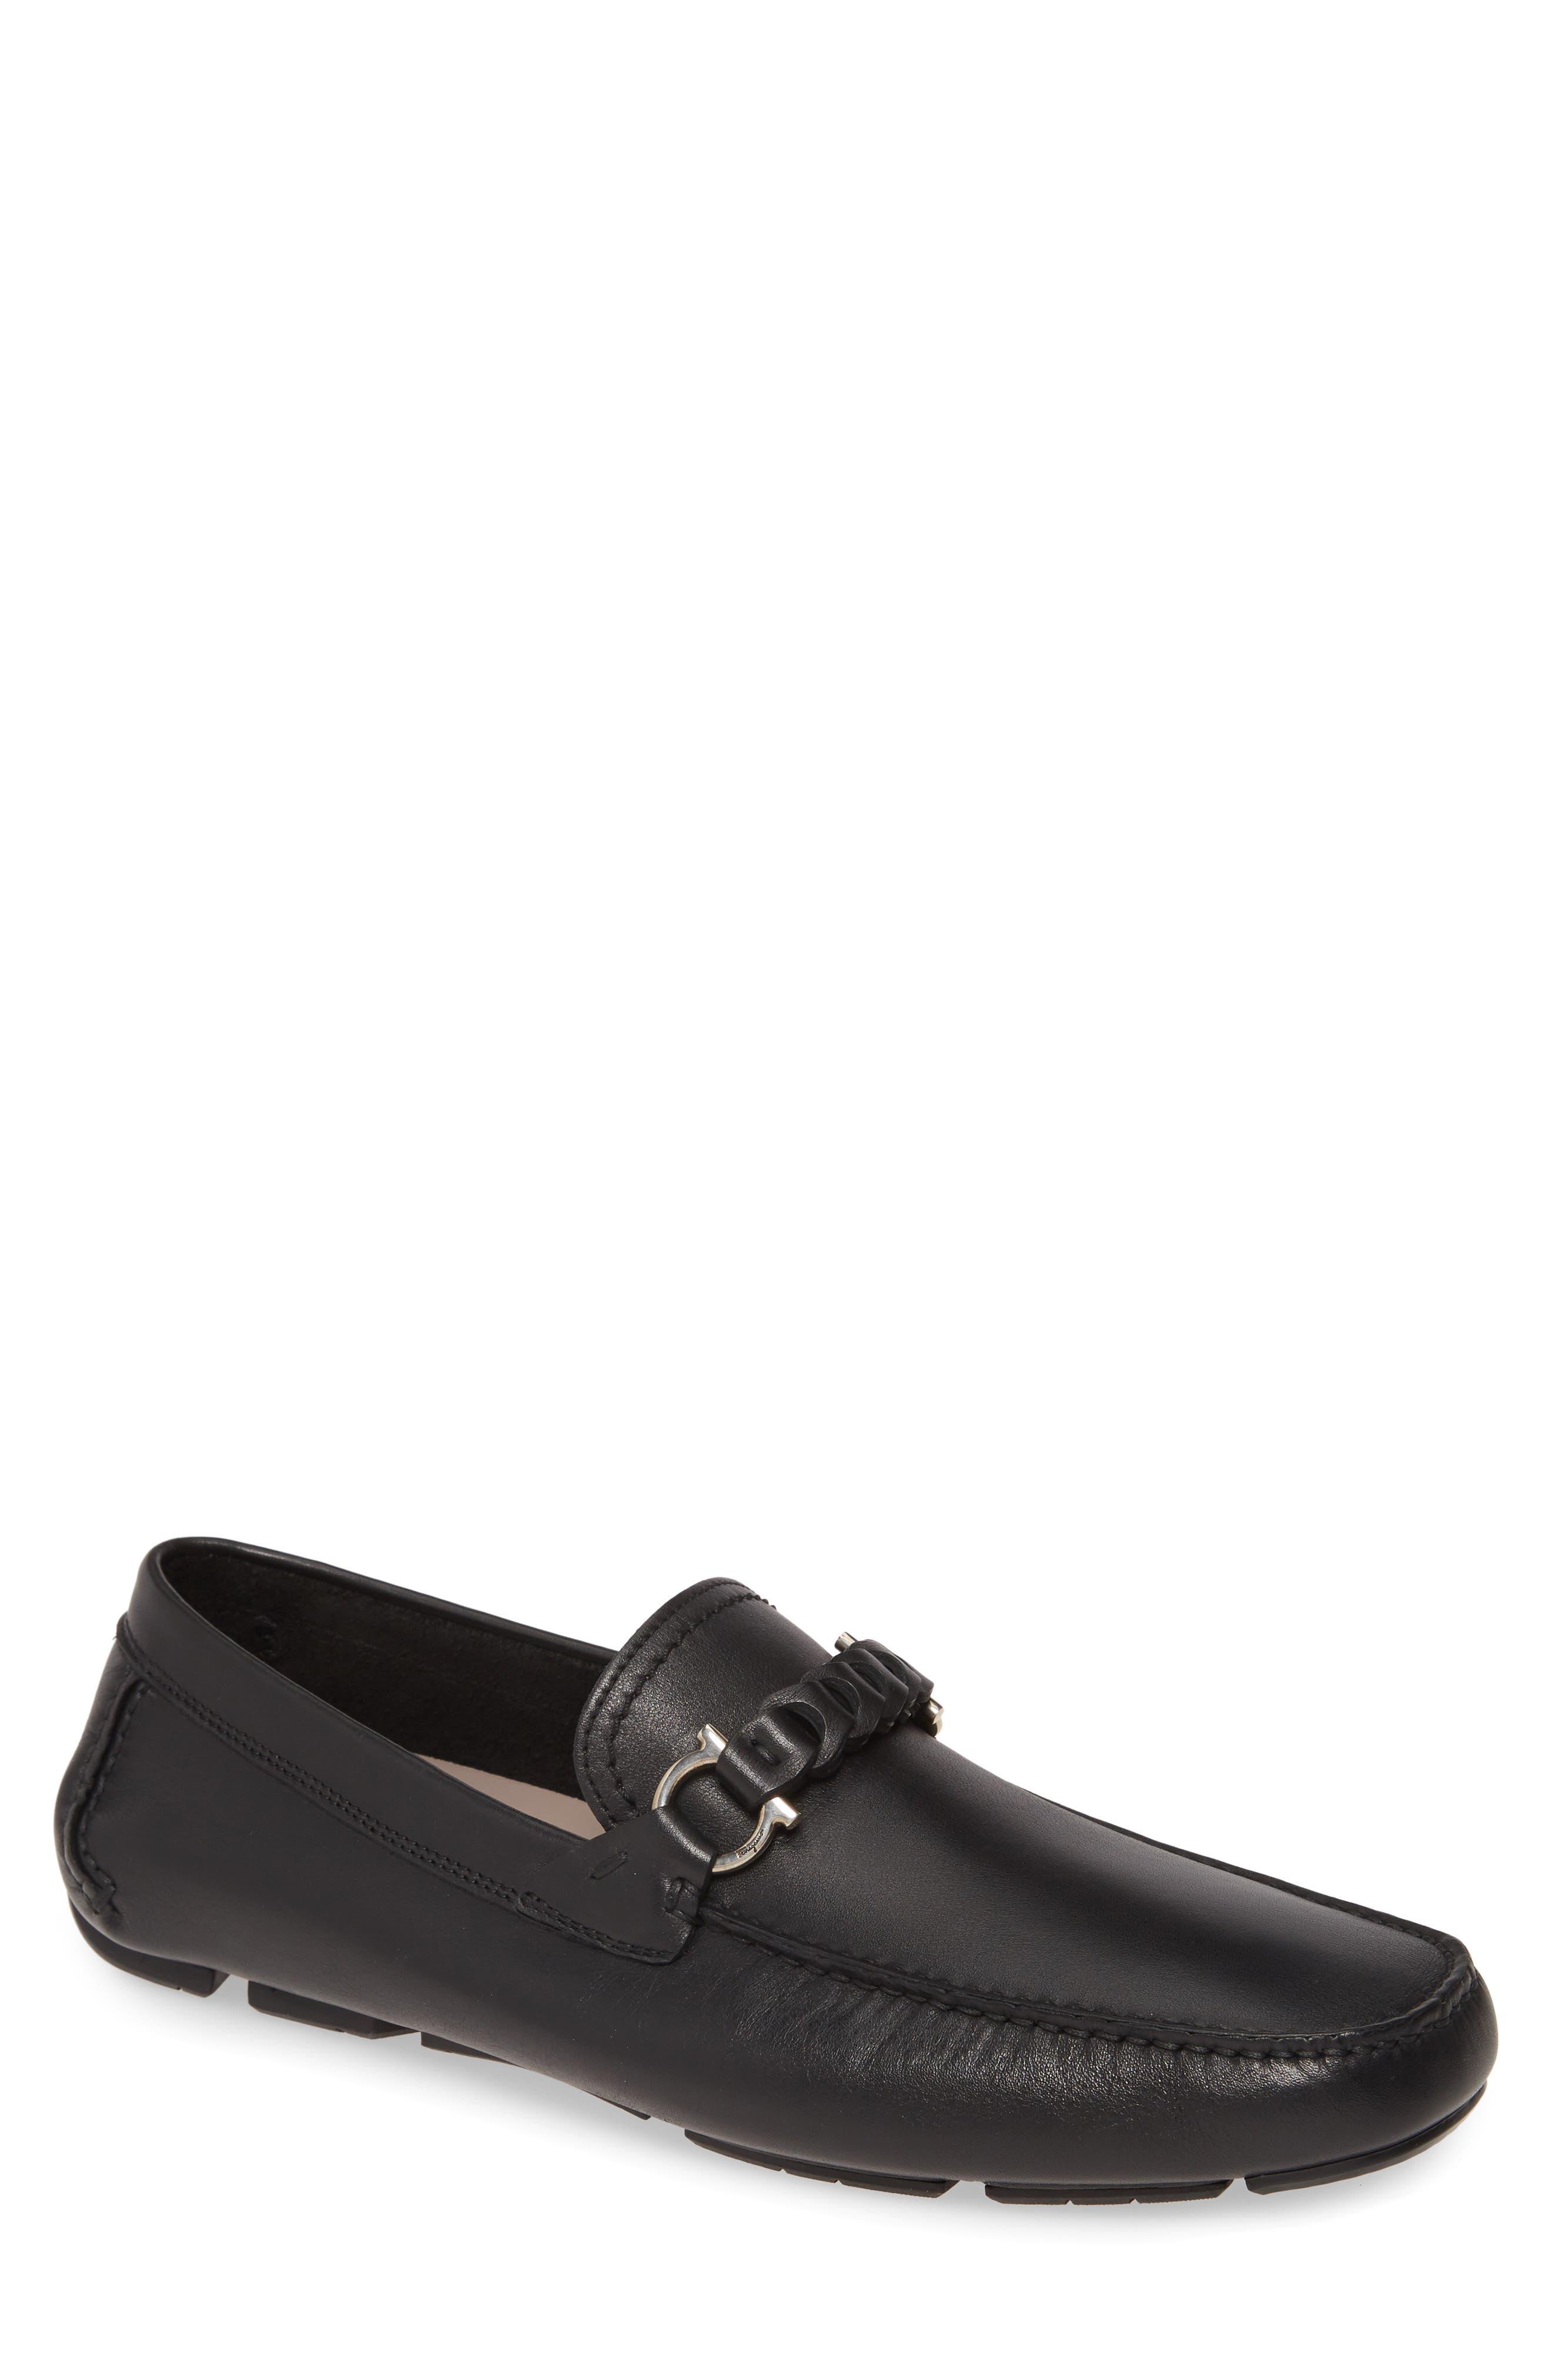 Men's Salvatore Ferragamo Stuart Driving Shoe